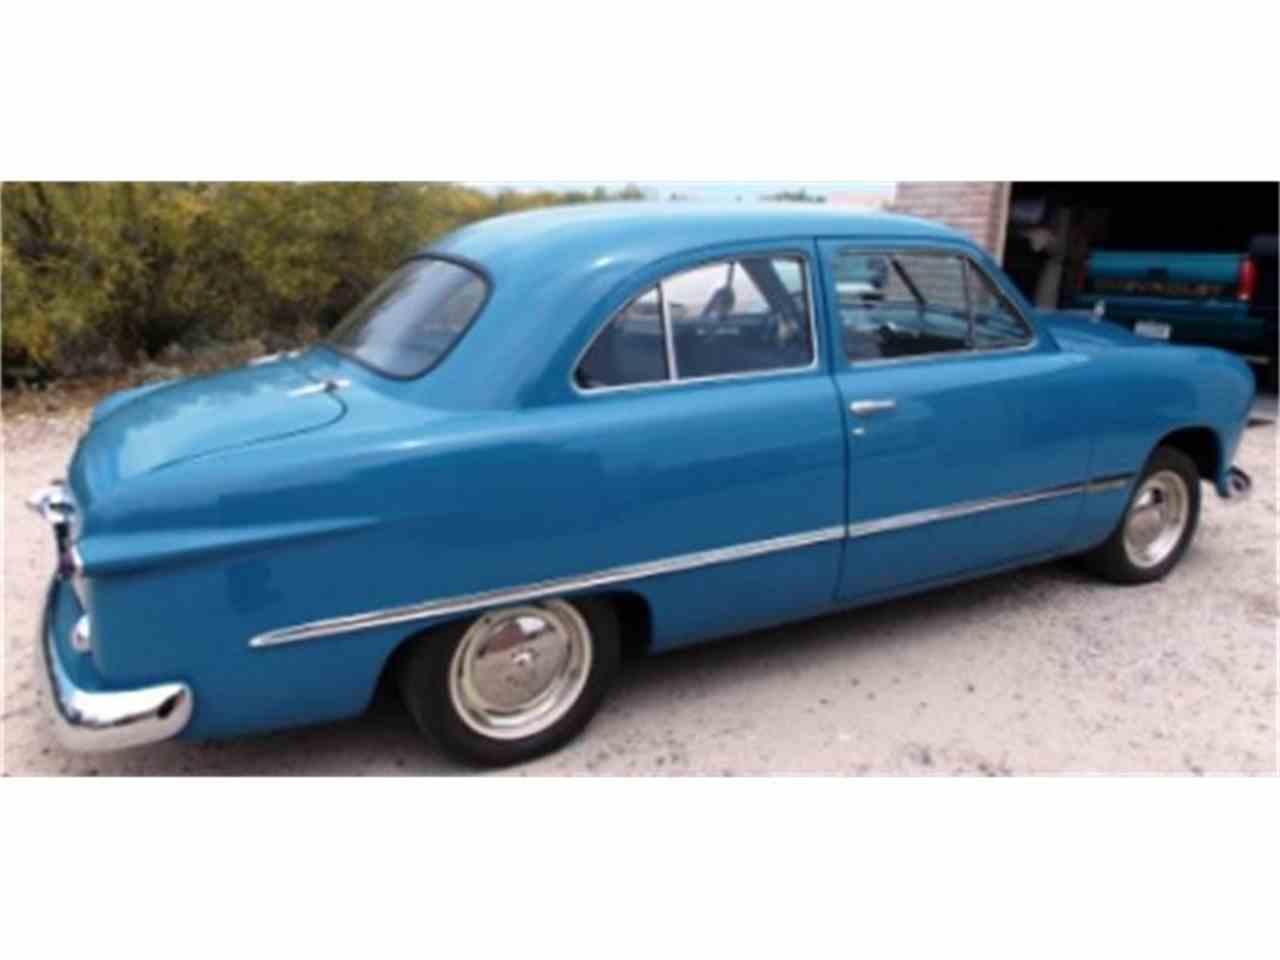 1949 ford 2 dr sedan for sale cc 673516 for 1949 ford 2 door sedan for sale